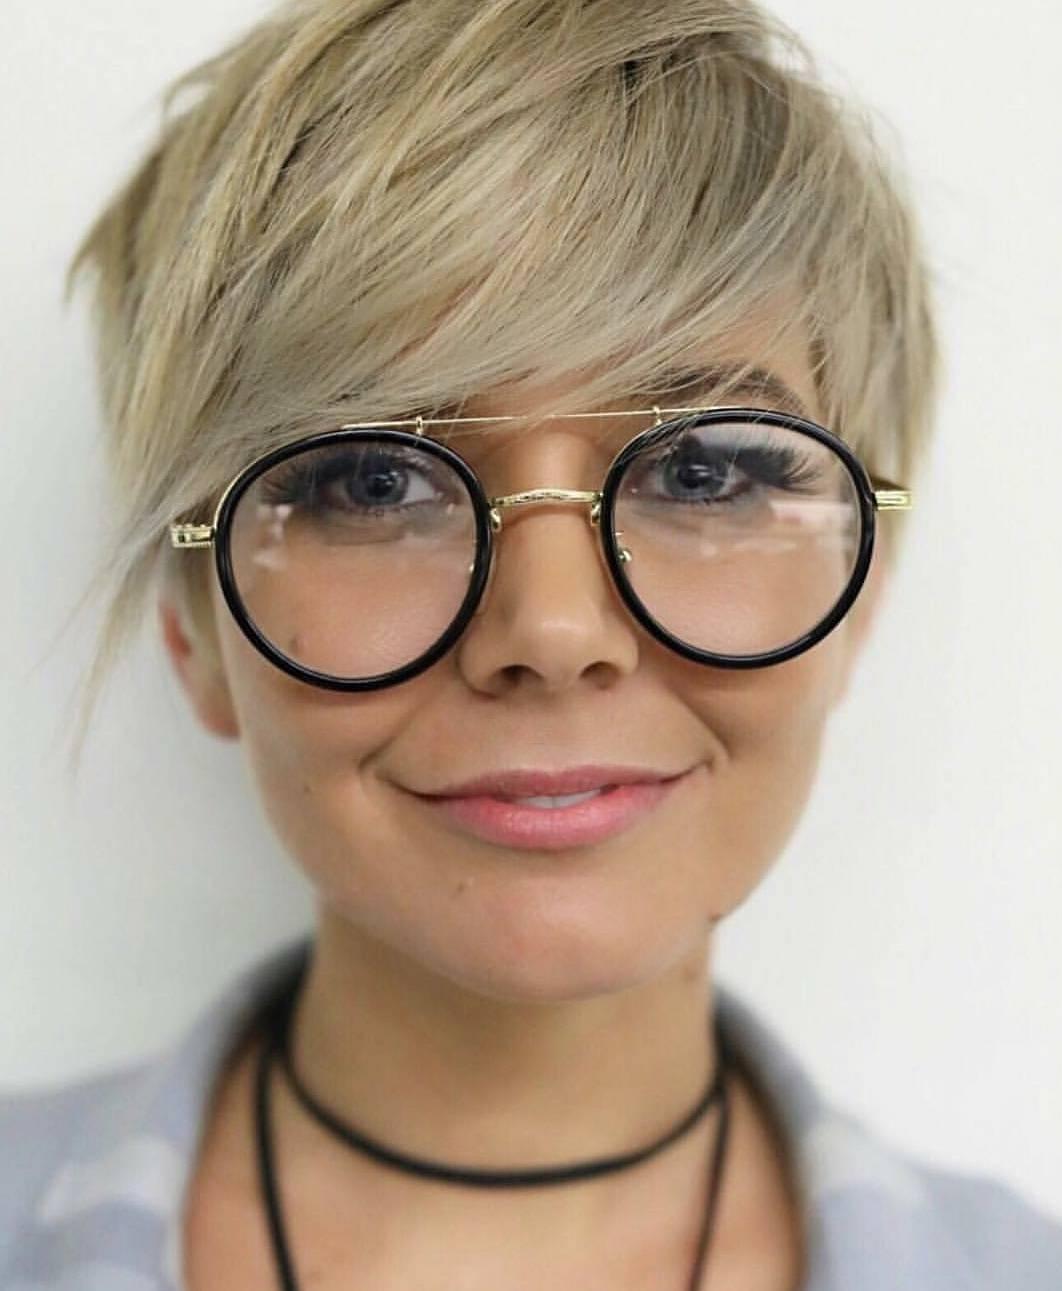 Razored Banged Fine Pixie with Glasses